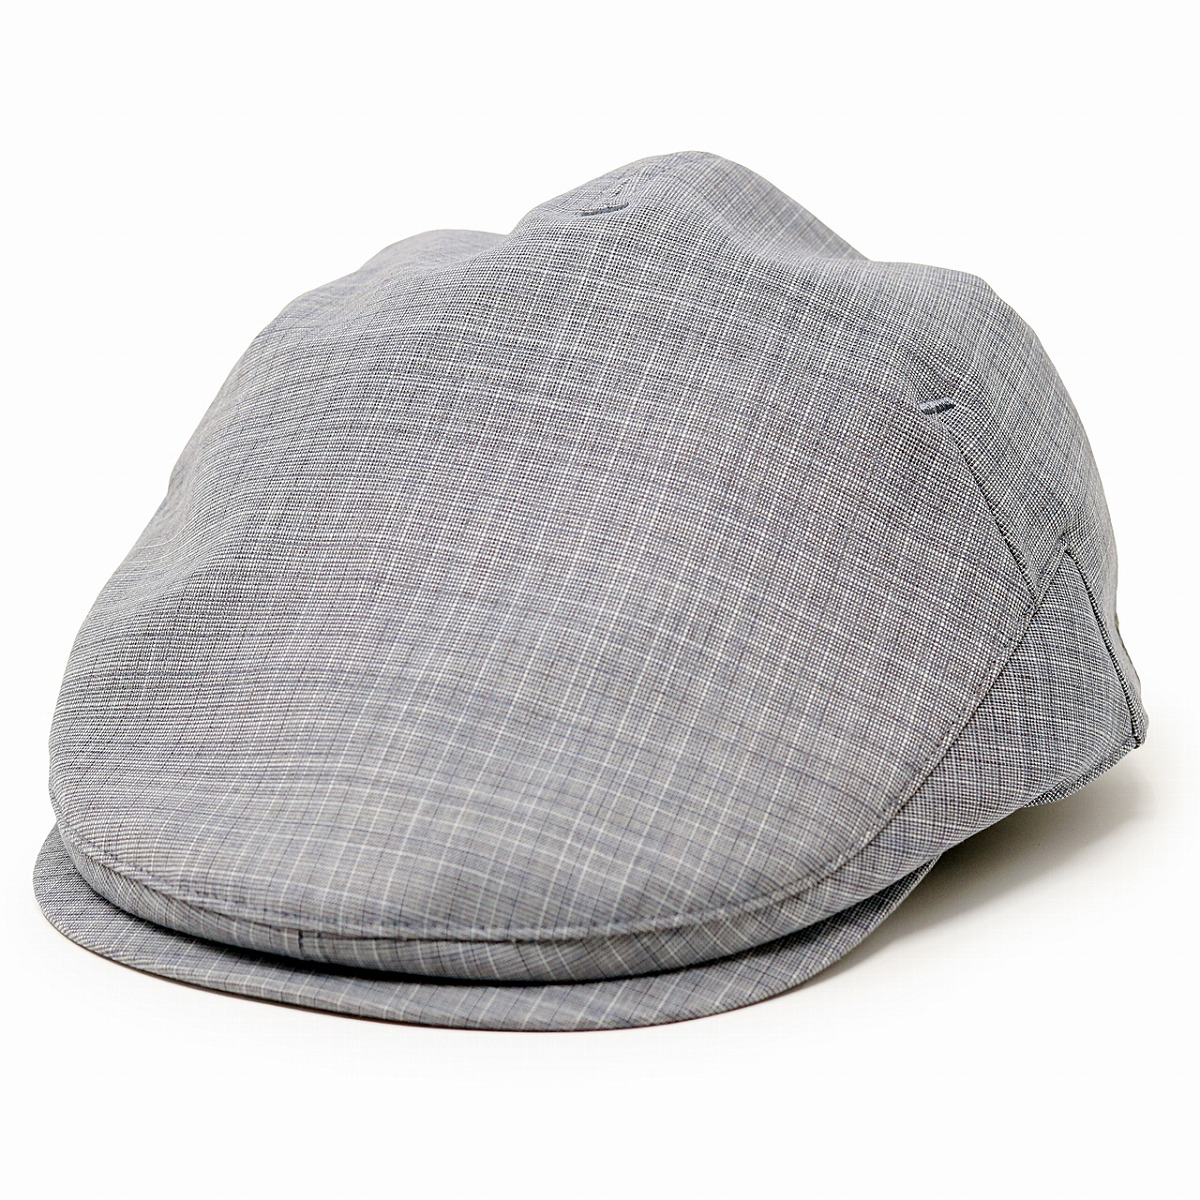 d6090bc4c7e ... It is a gift present in natural fiber Shin pull plain fabric daks  hunting cap hat ...